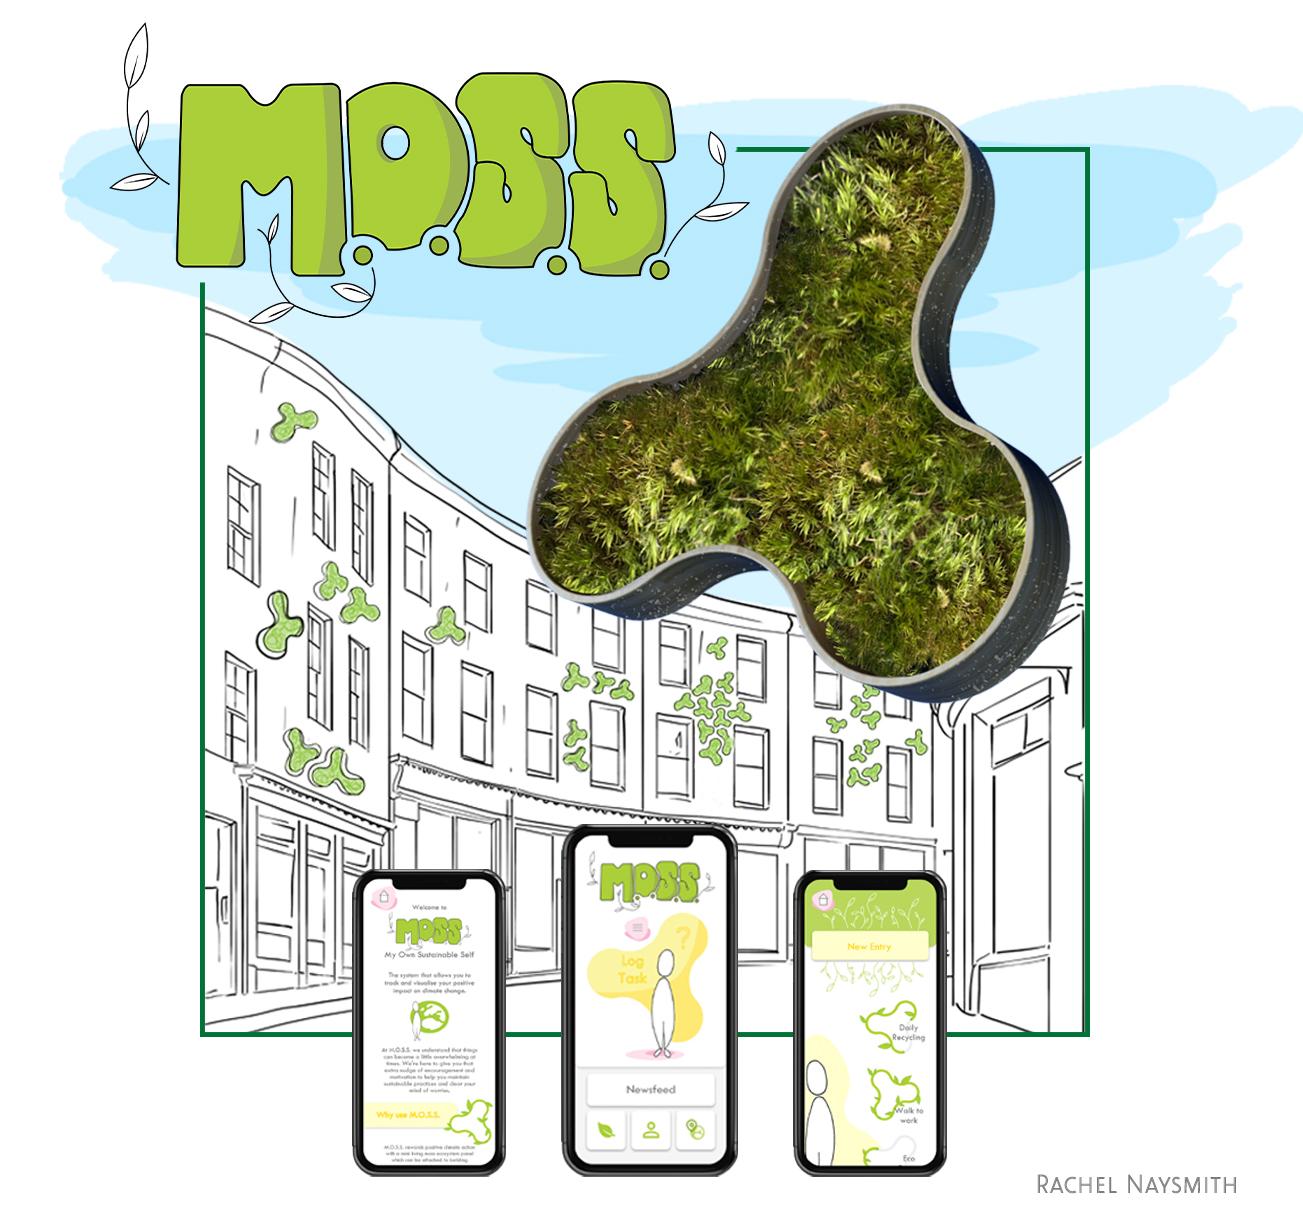 Rachel's app M.O.S.S. - Scottish News